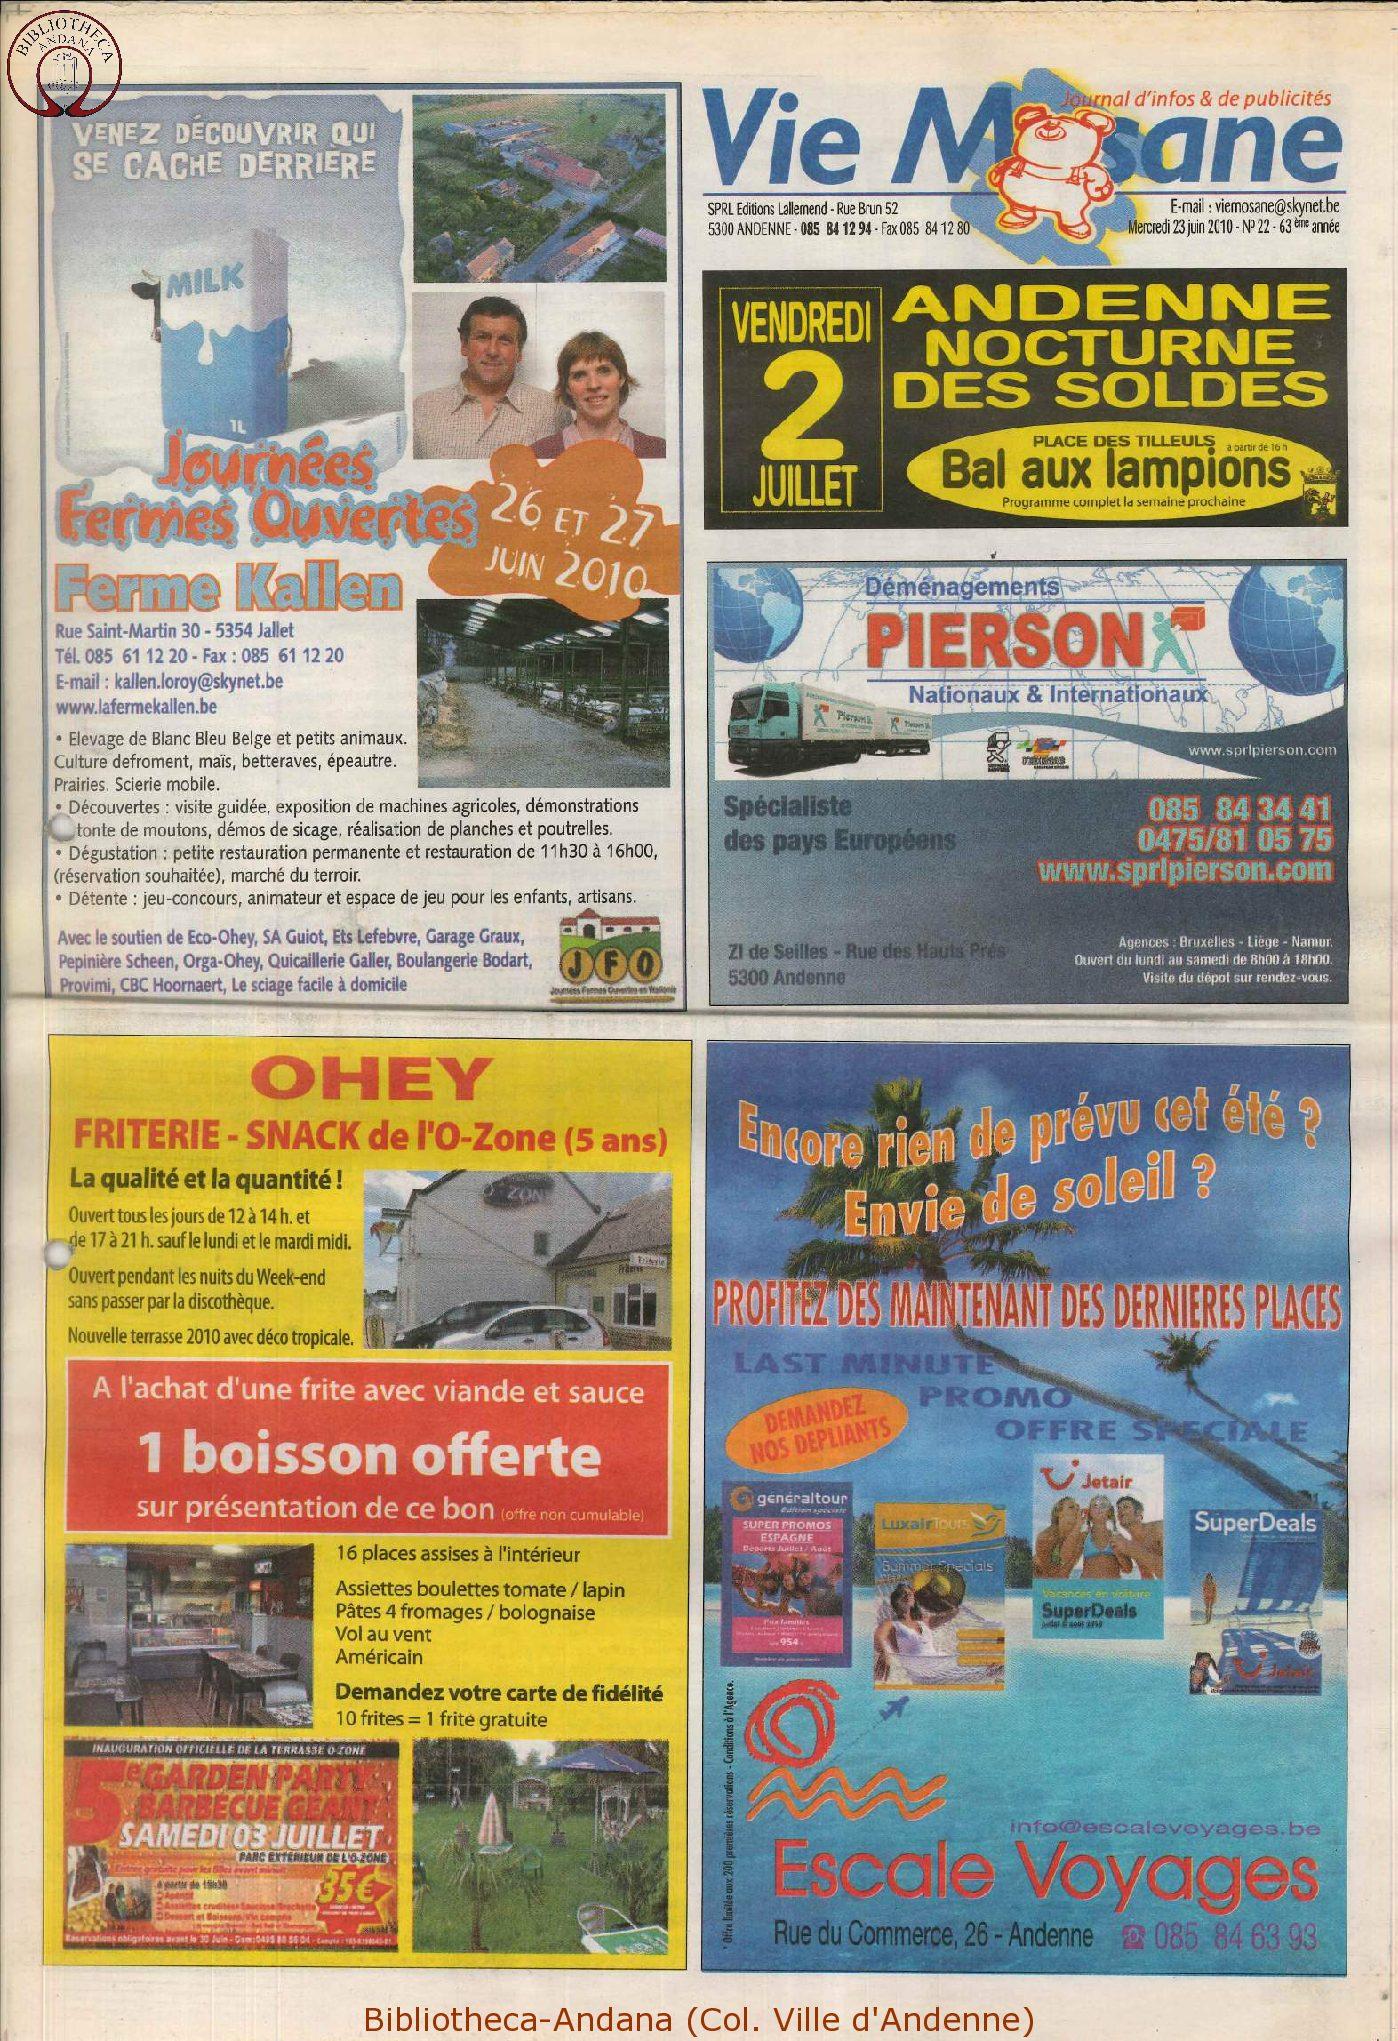 63e année - n°22 - 23 juin 2010